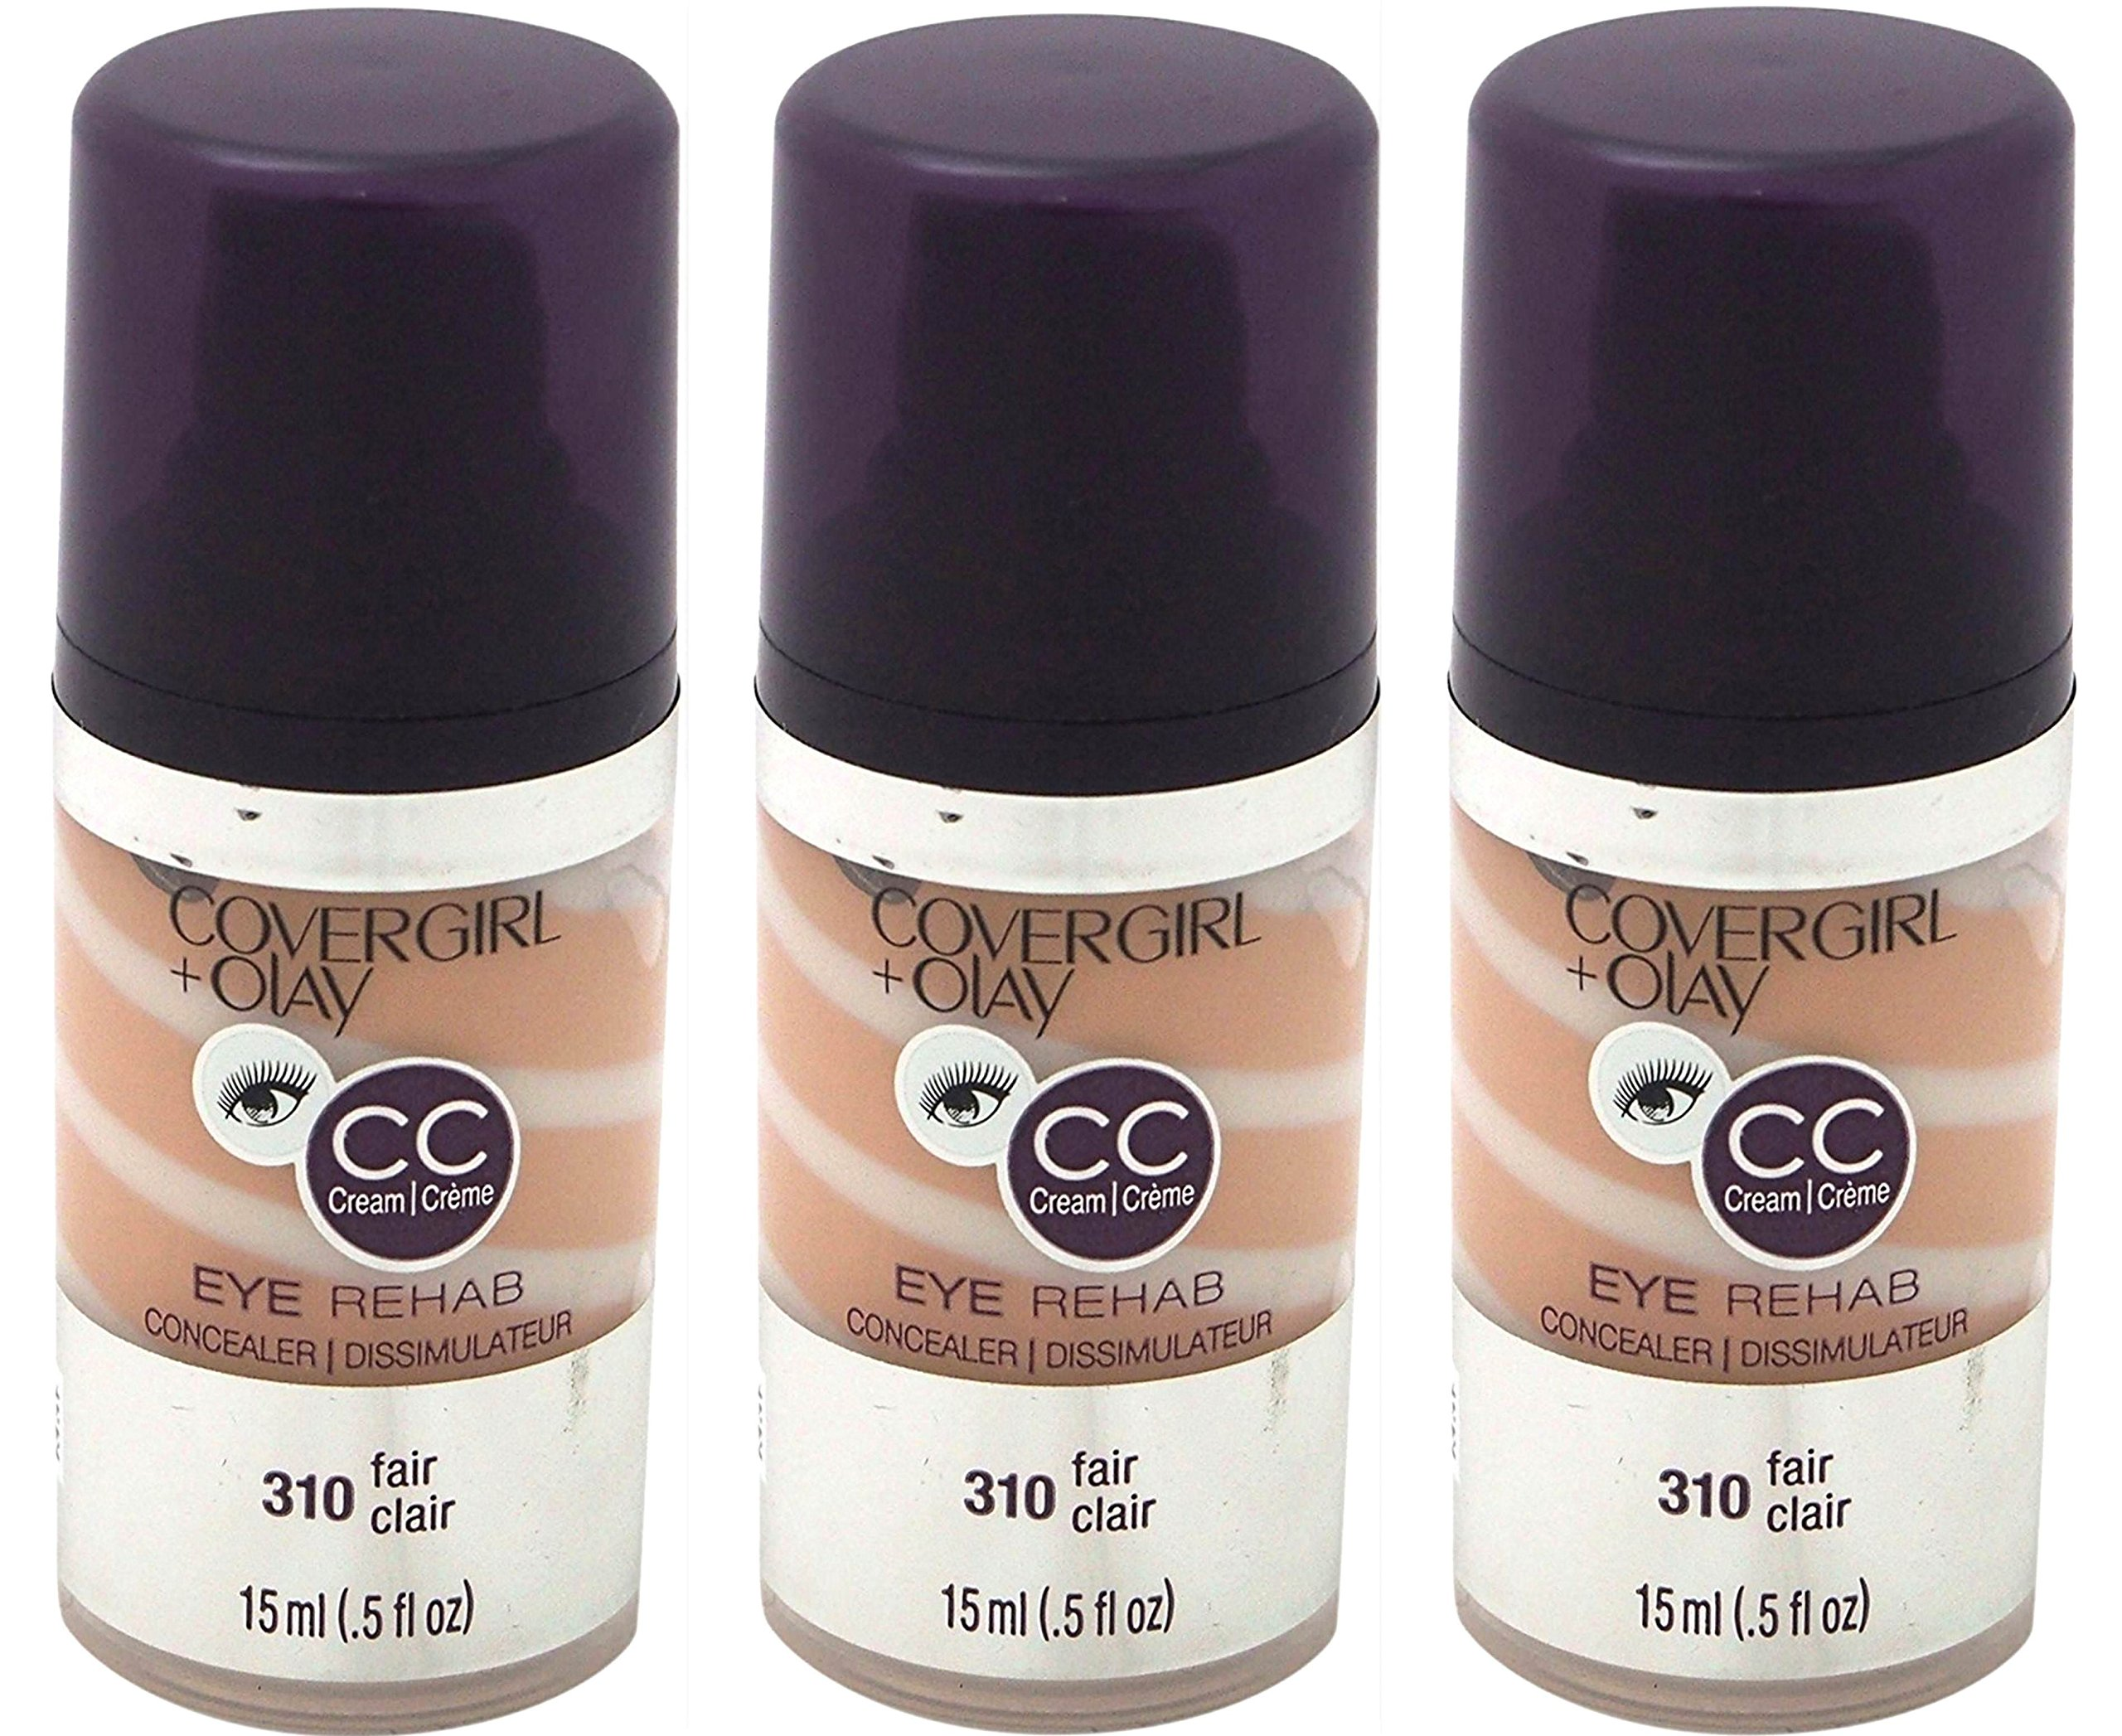 CoverGirl Plus Olay Eye Rehab Concealer (Fair 310,0.5 oz) PACK OF 3